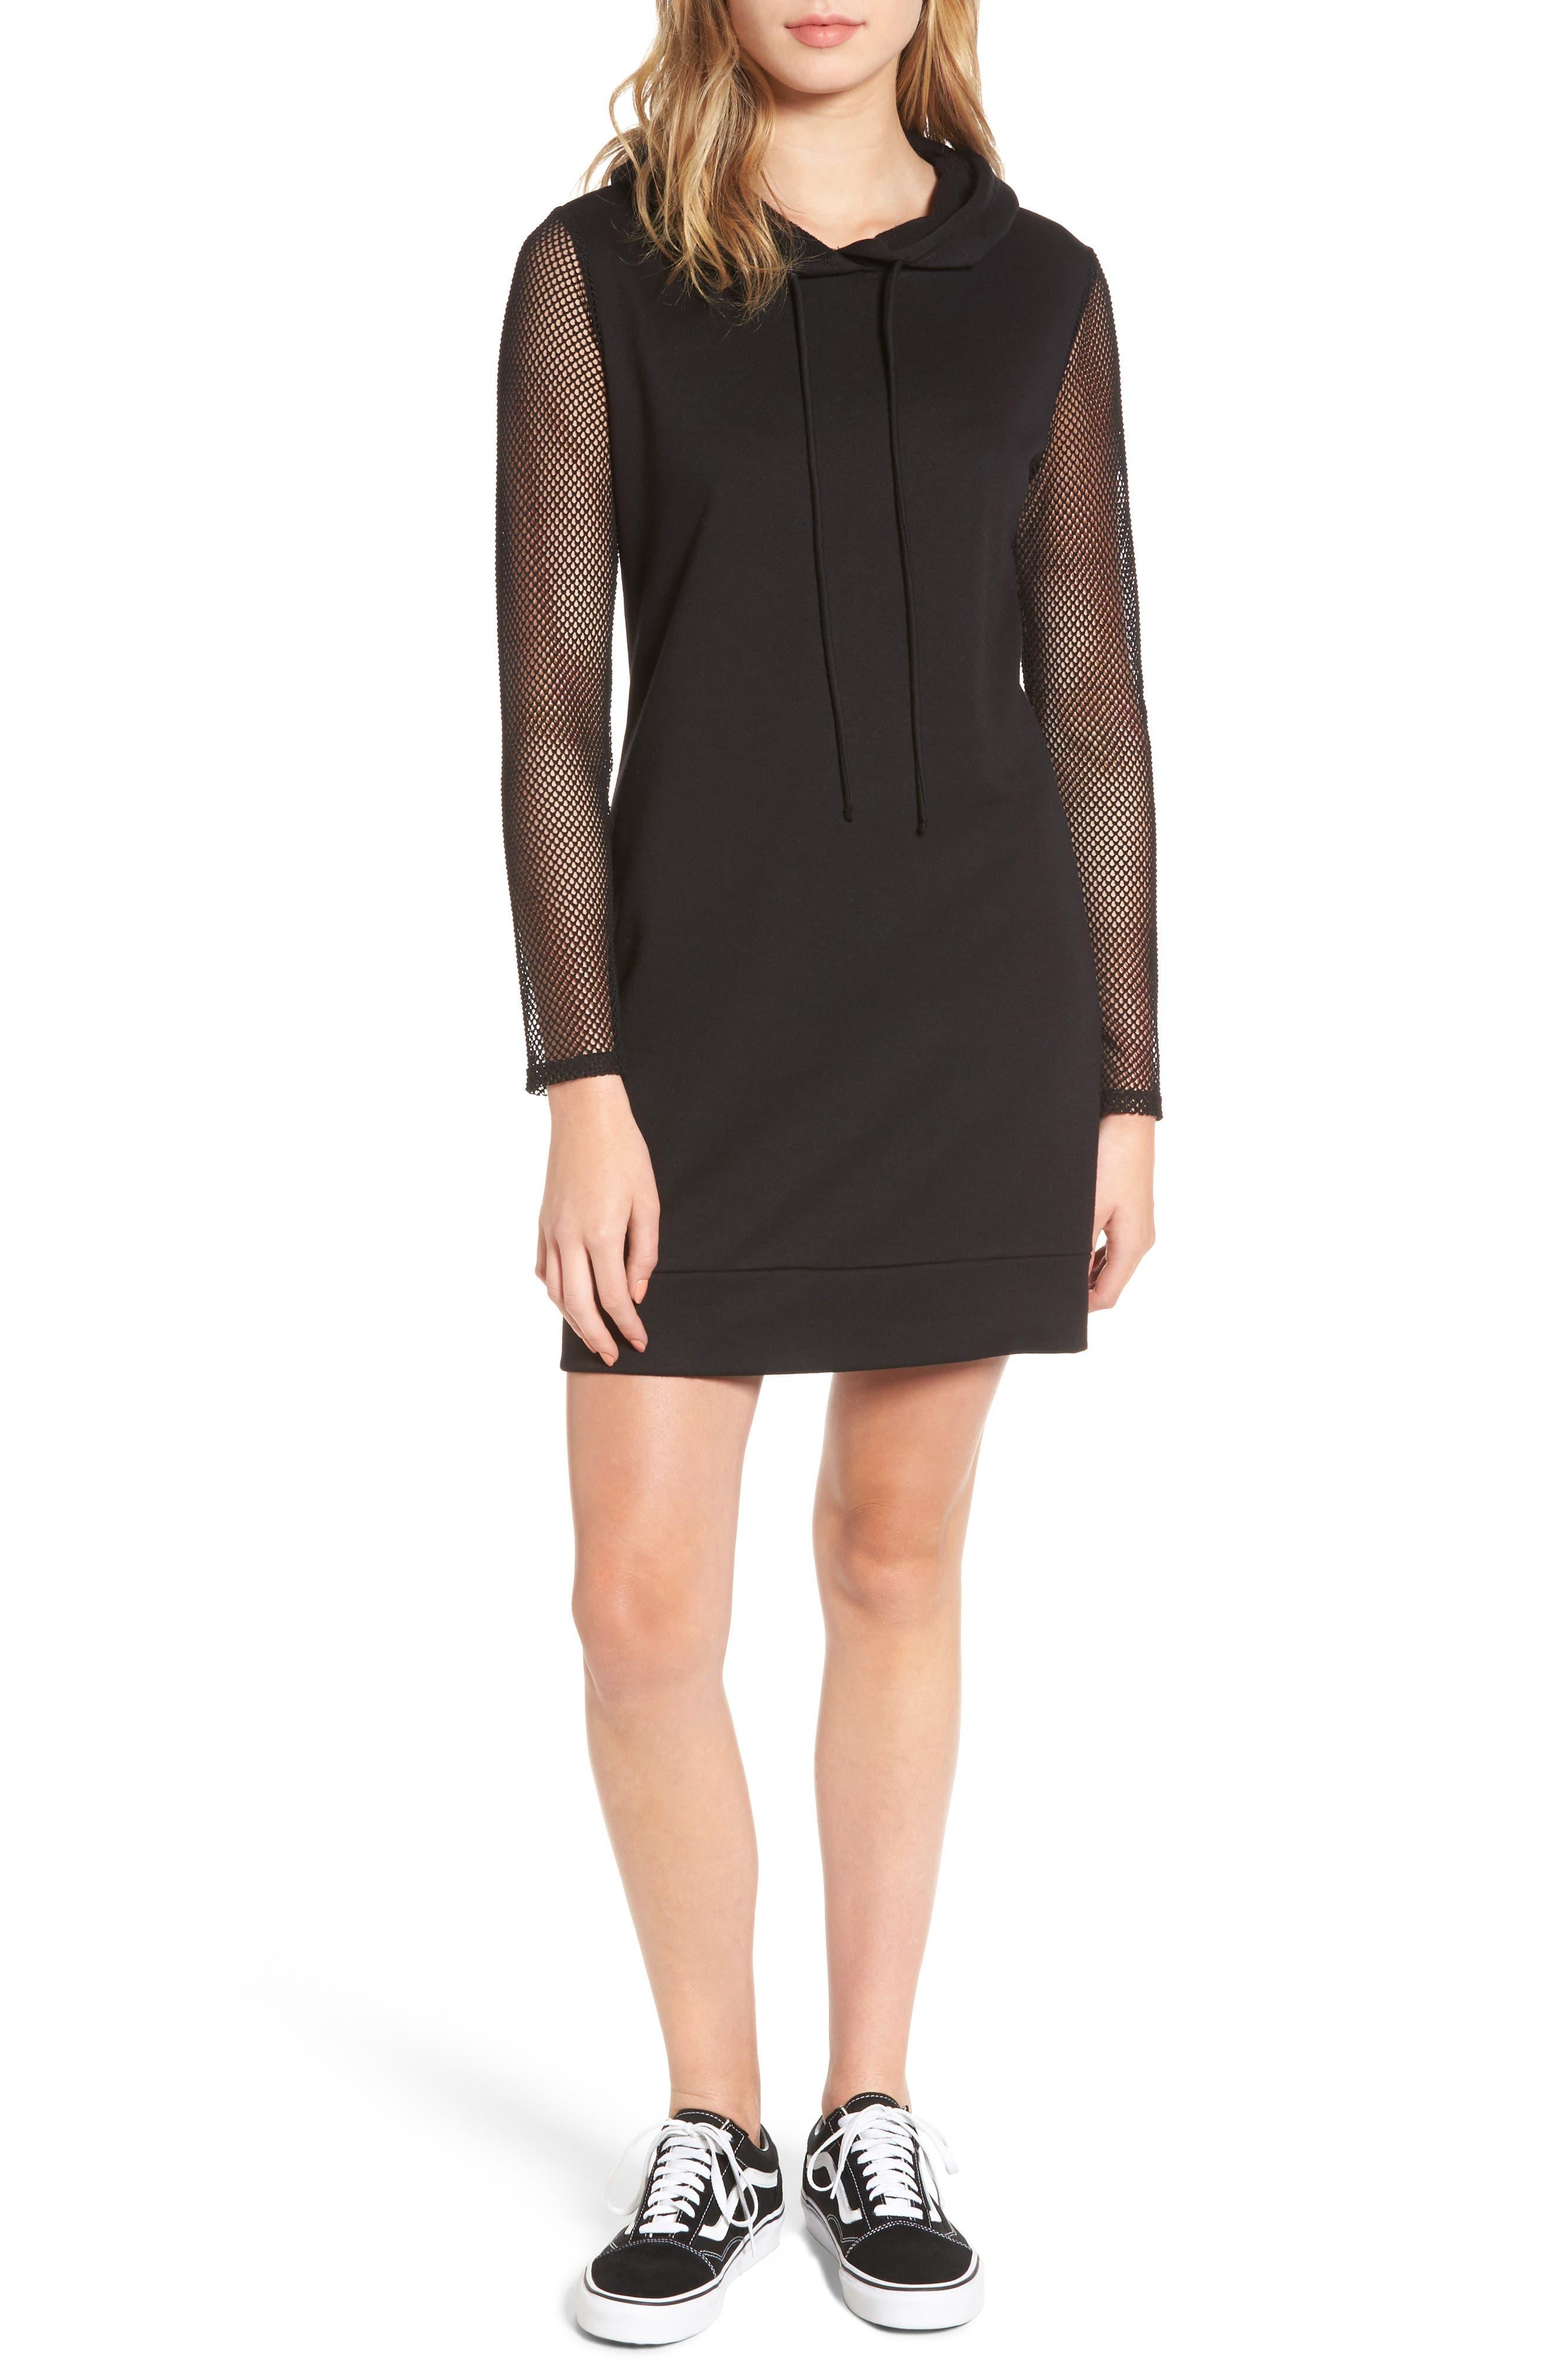 Main Image - One Clothing Mesh Sleeve Hoodie Dress